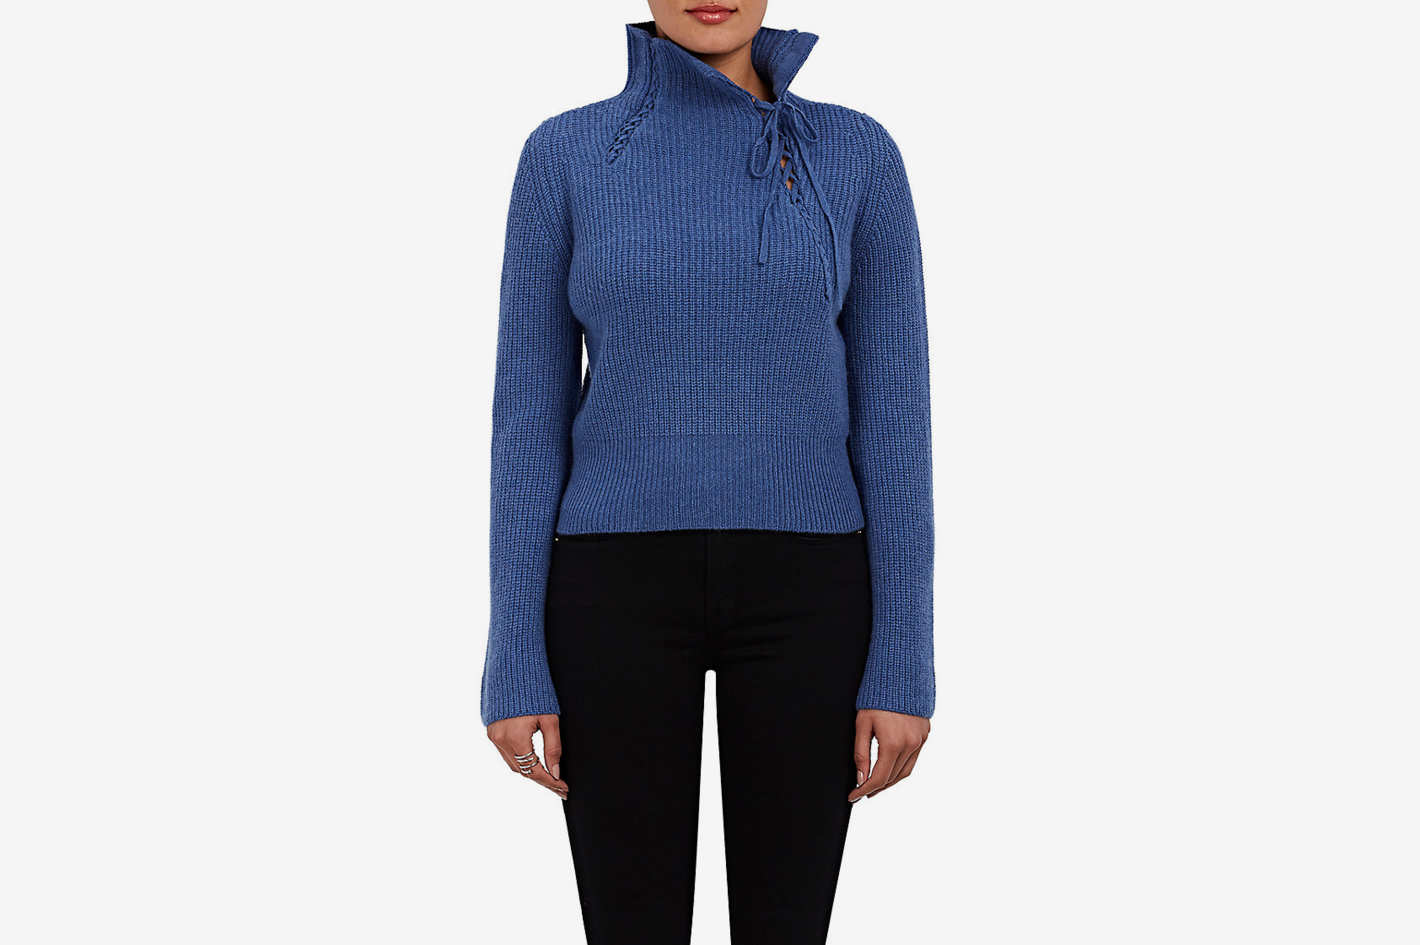 Derek Lam 10 Crosby Wool-Blend Mock Turtleneck Sweater